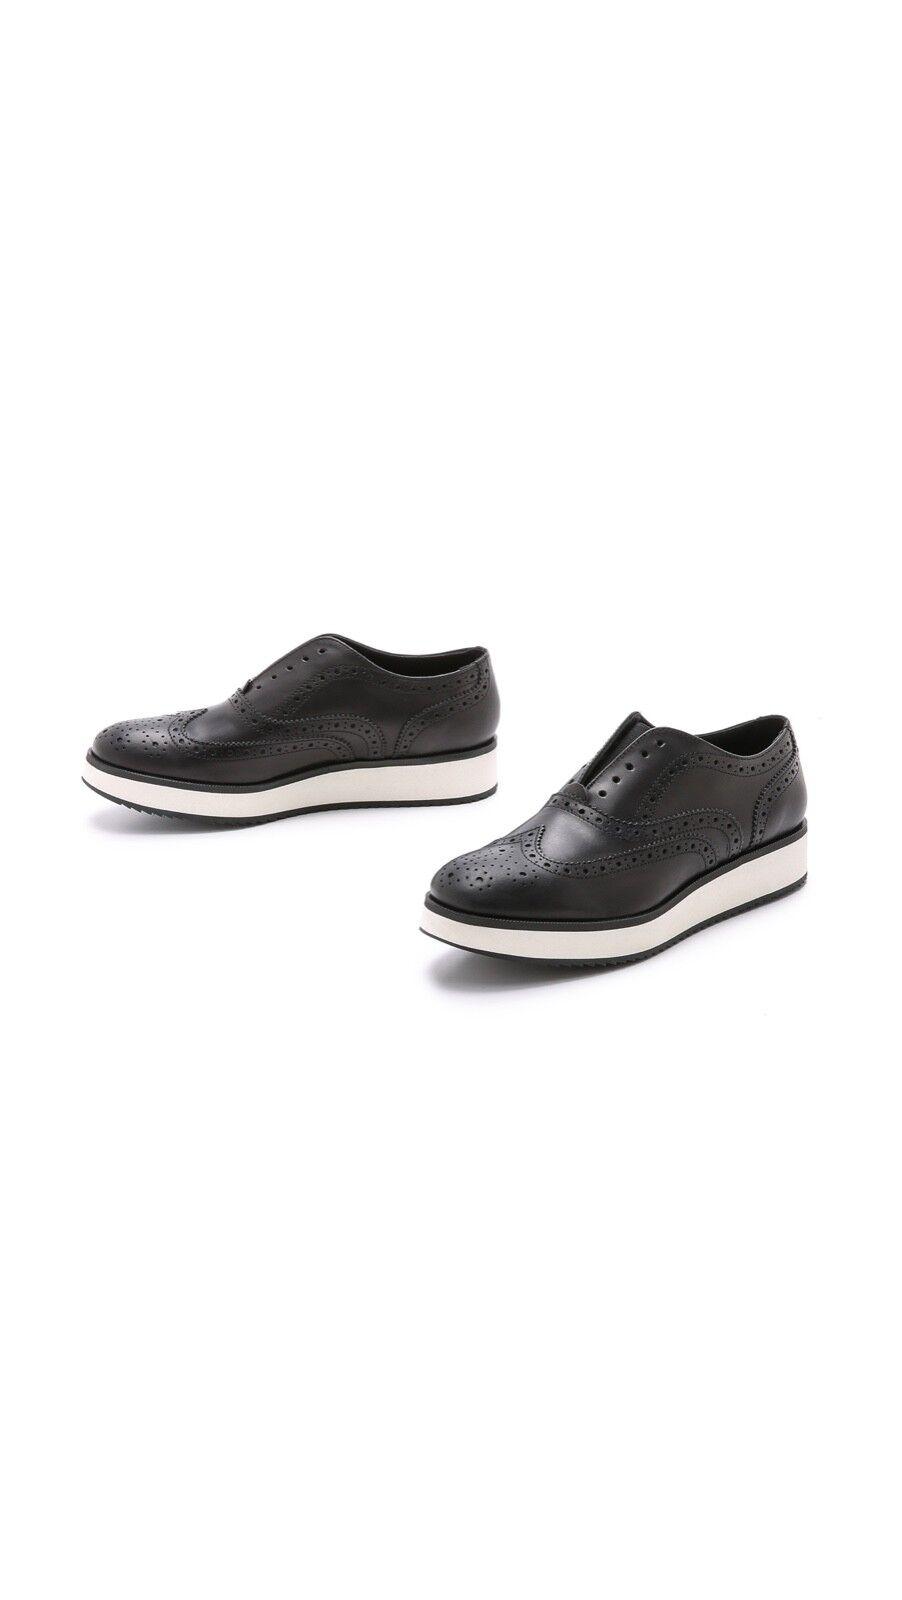 Rag & Bone Meli Leather Wingtip Oxfords 38 8 Women's shoes Saddle Black Leather